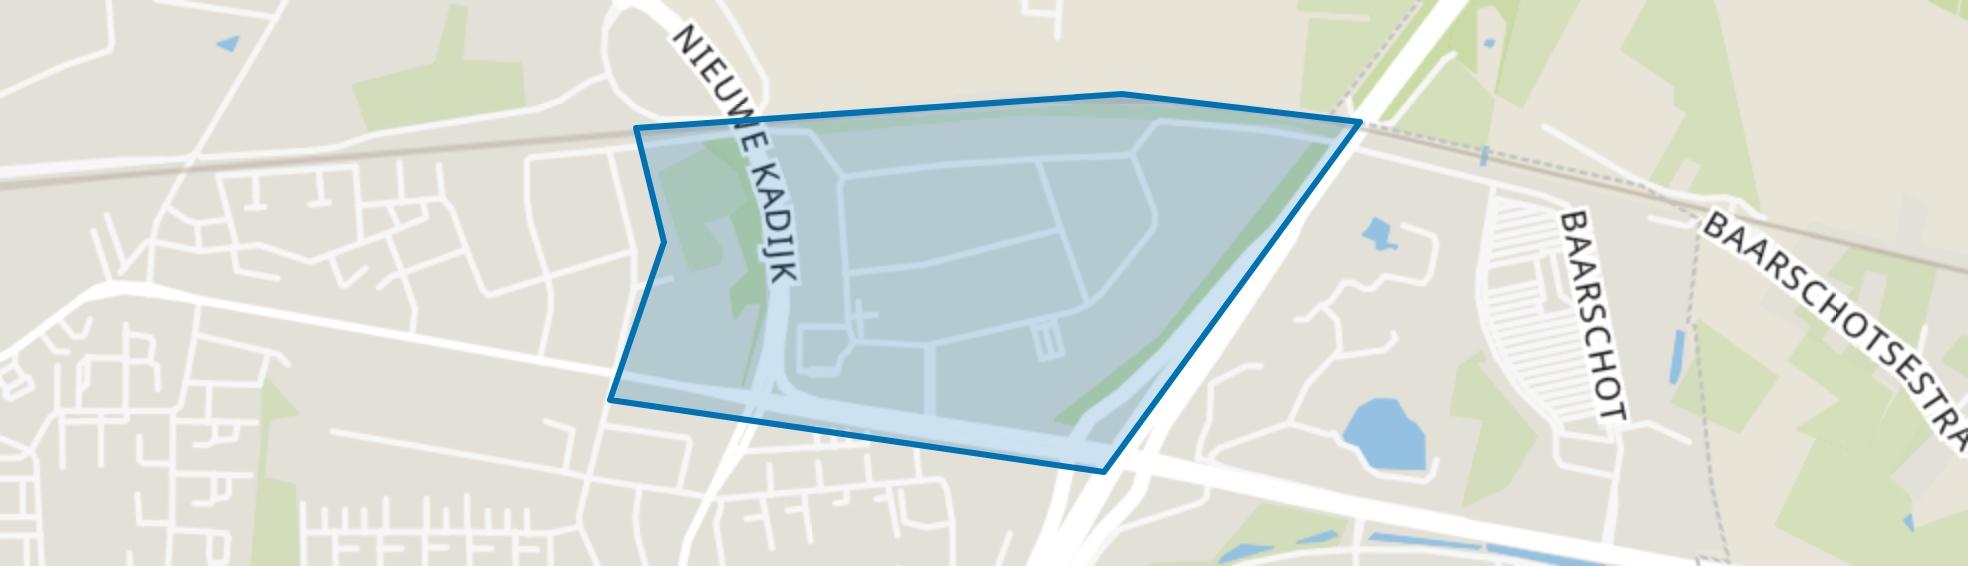 Moleneind-oost, Breda map